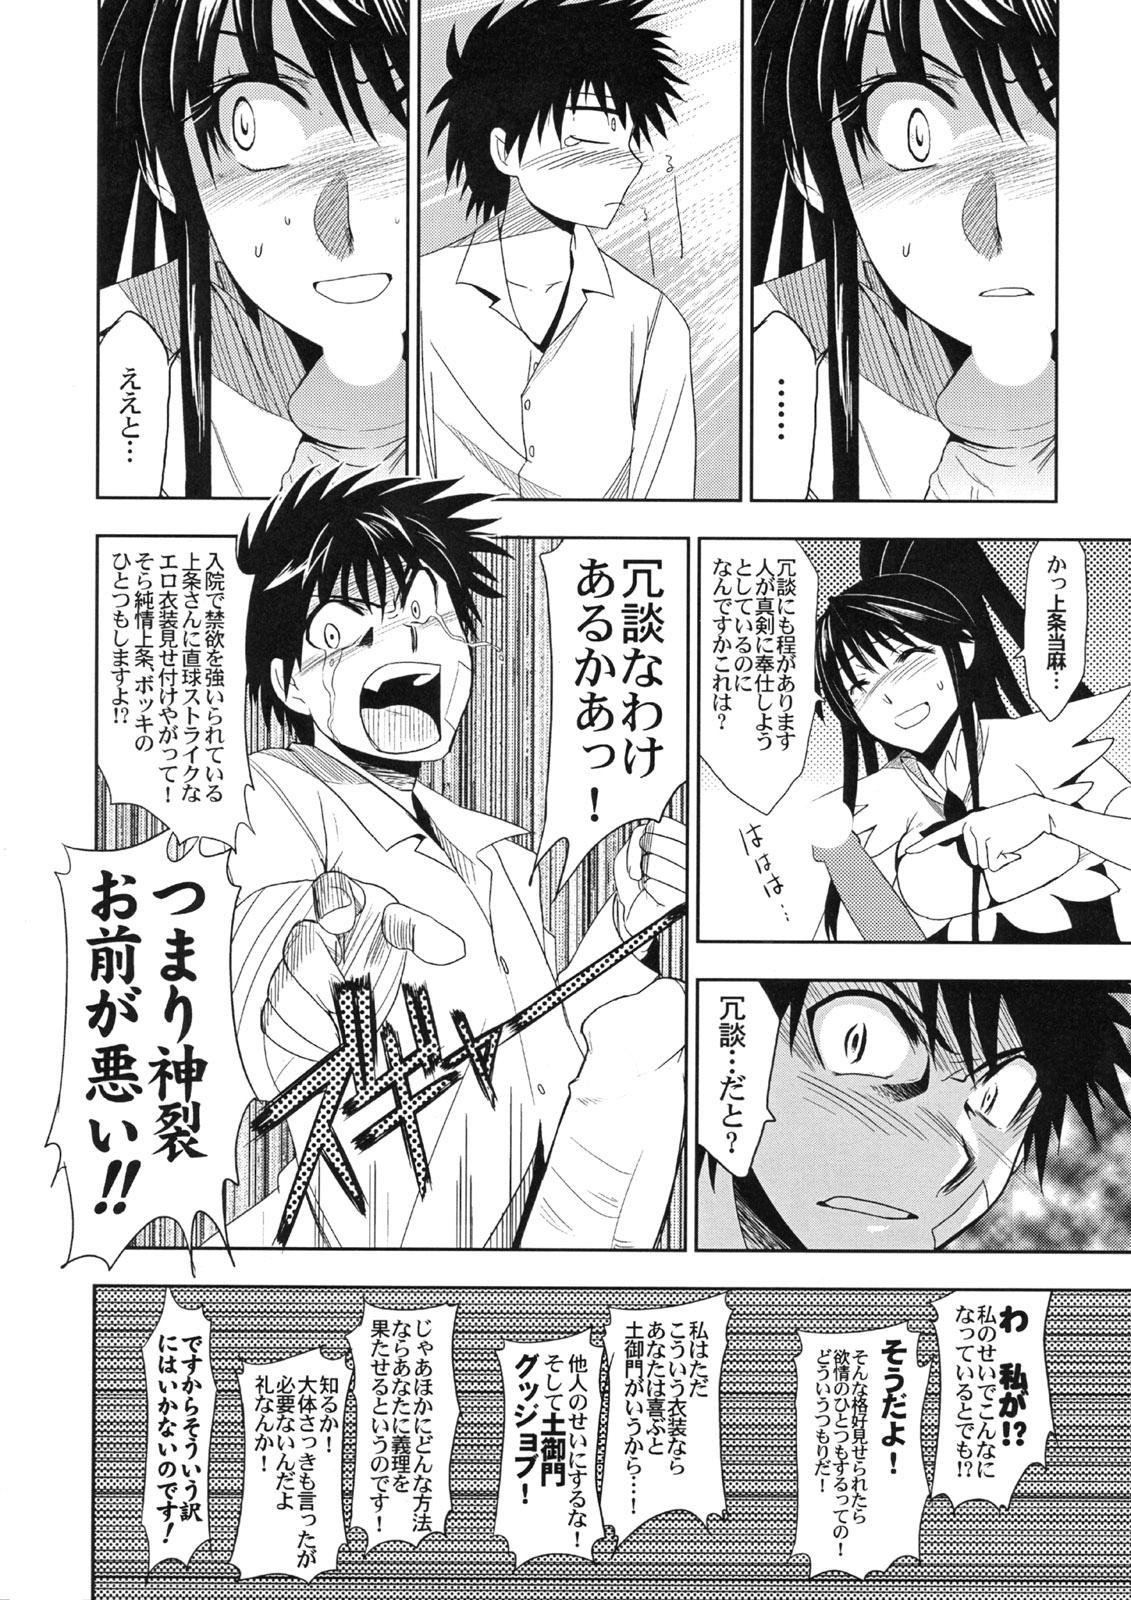 ouji ohime-sama usotsuki nayameru to Pirates of the caribbean naked